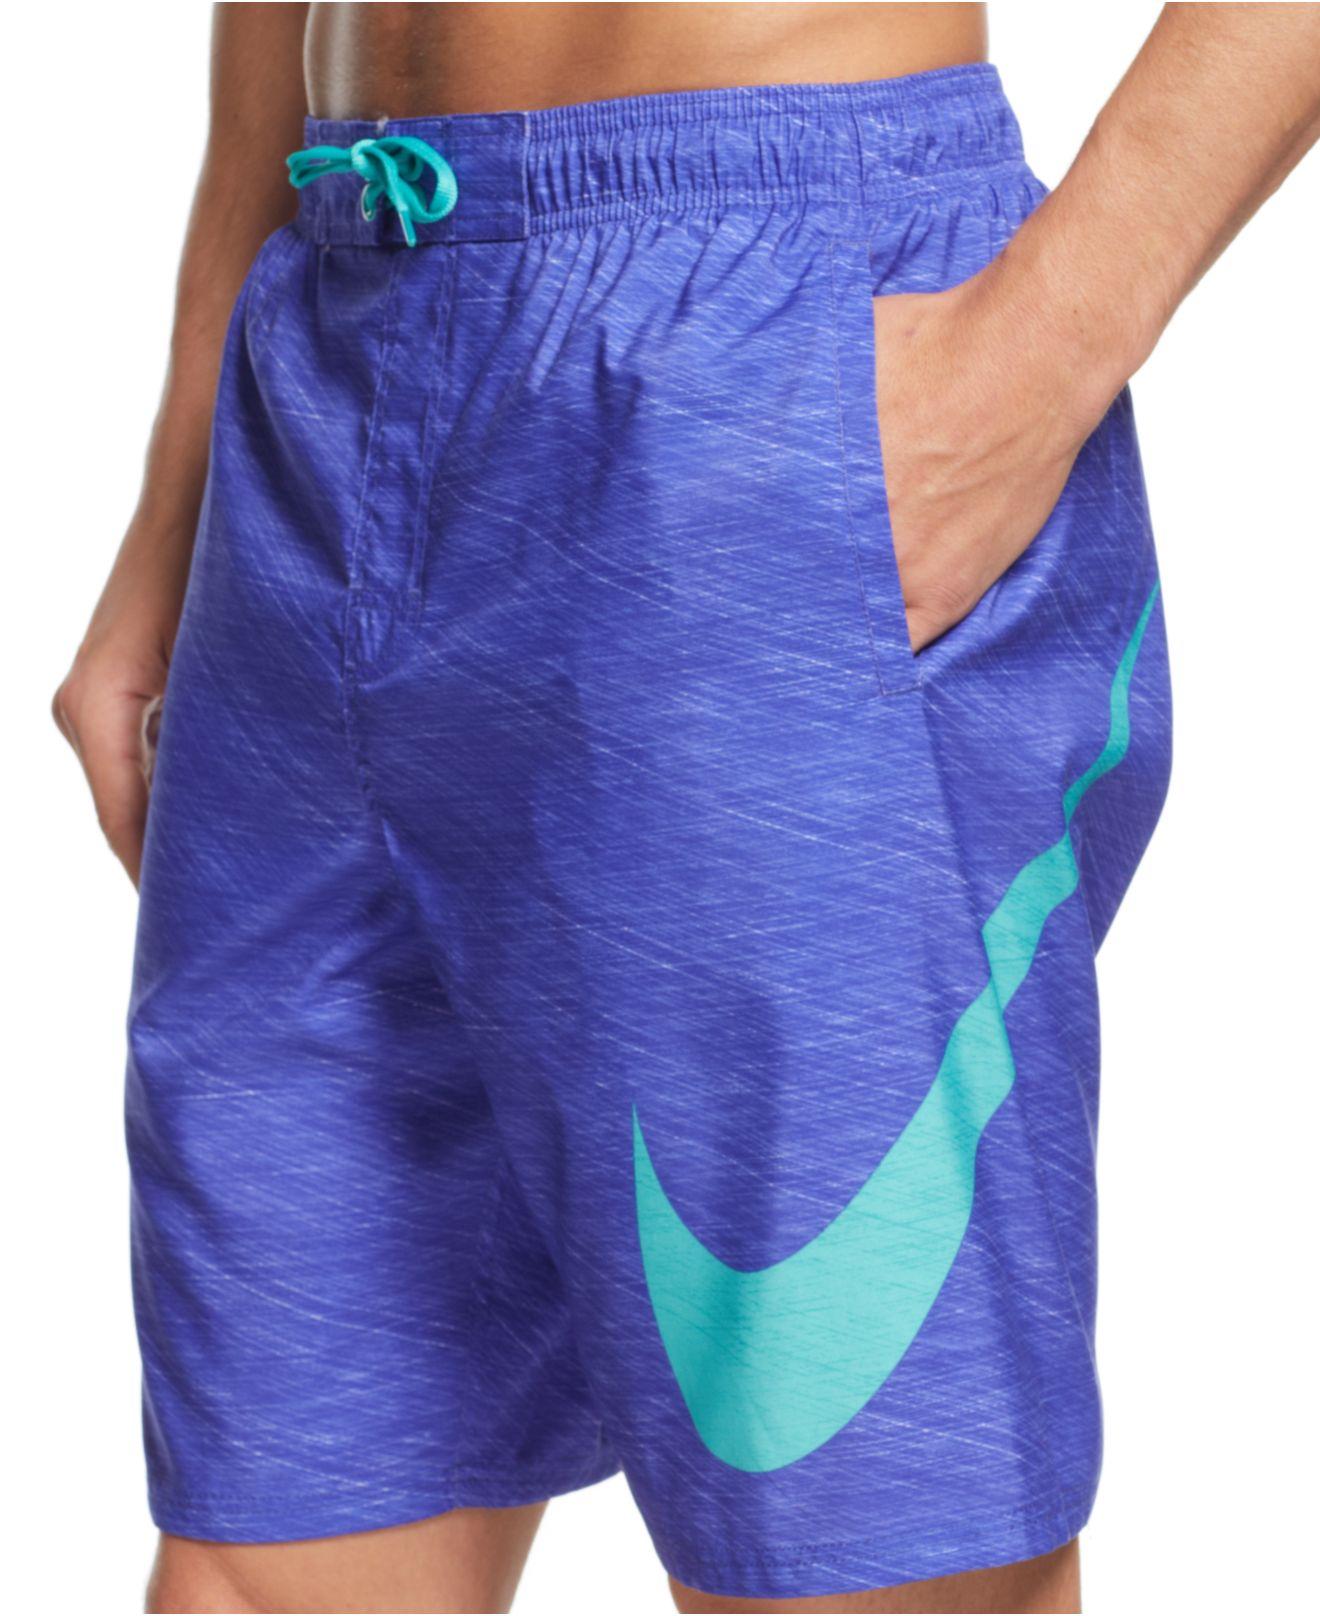 8a01543954 ... Nike Swimwear For Men: Nike Hyper Flash 9